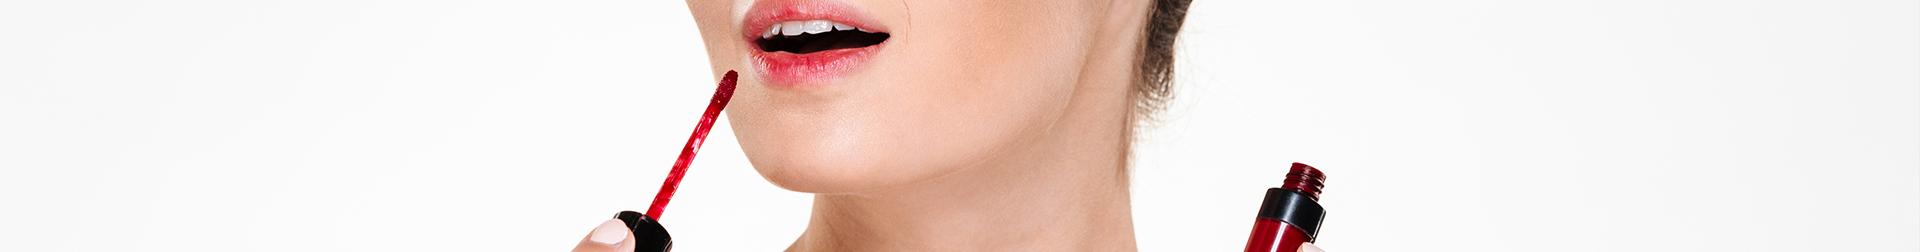 Makeup Lip Products | Buy Lip Gloss Online | AromaCraze